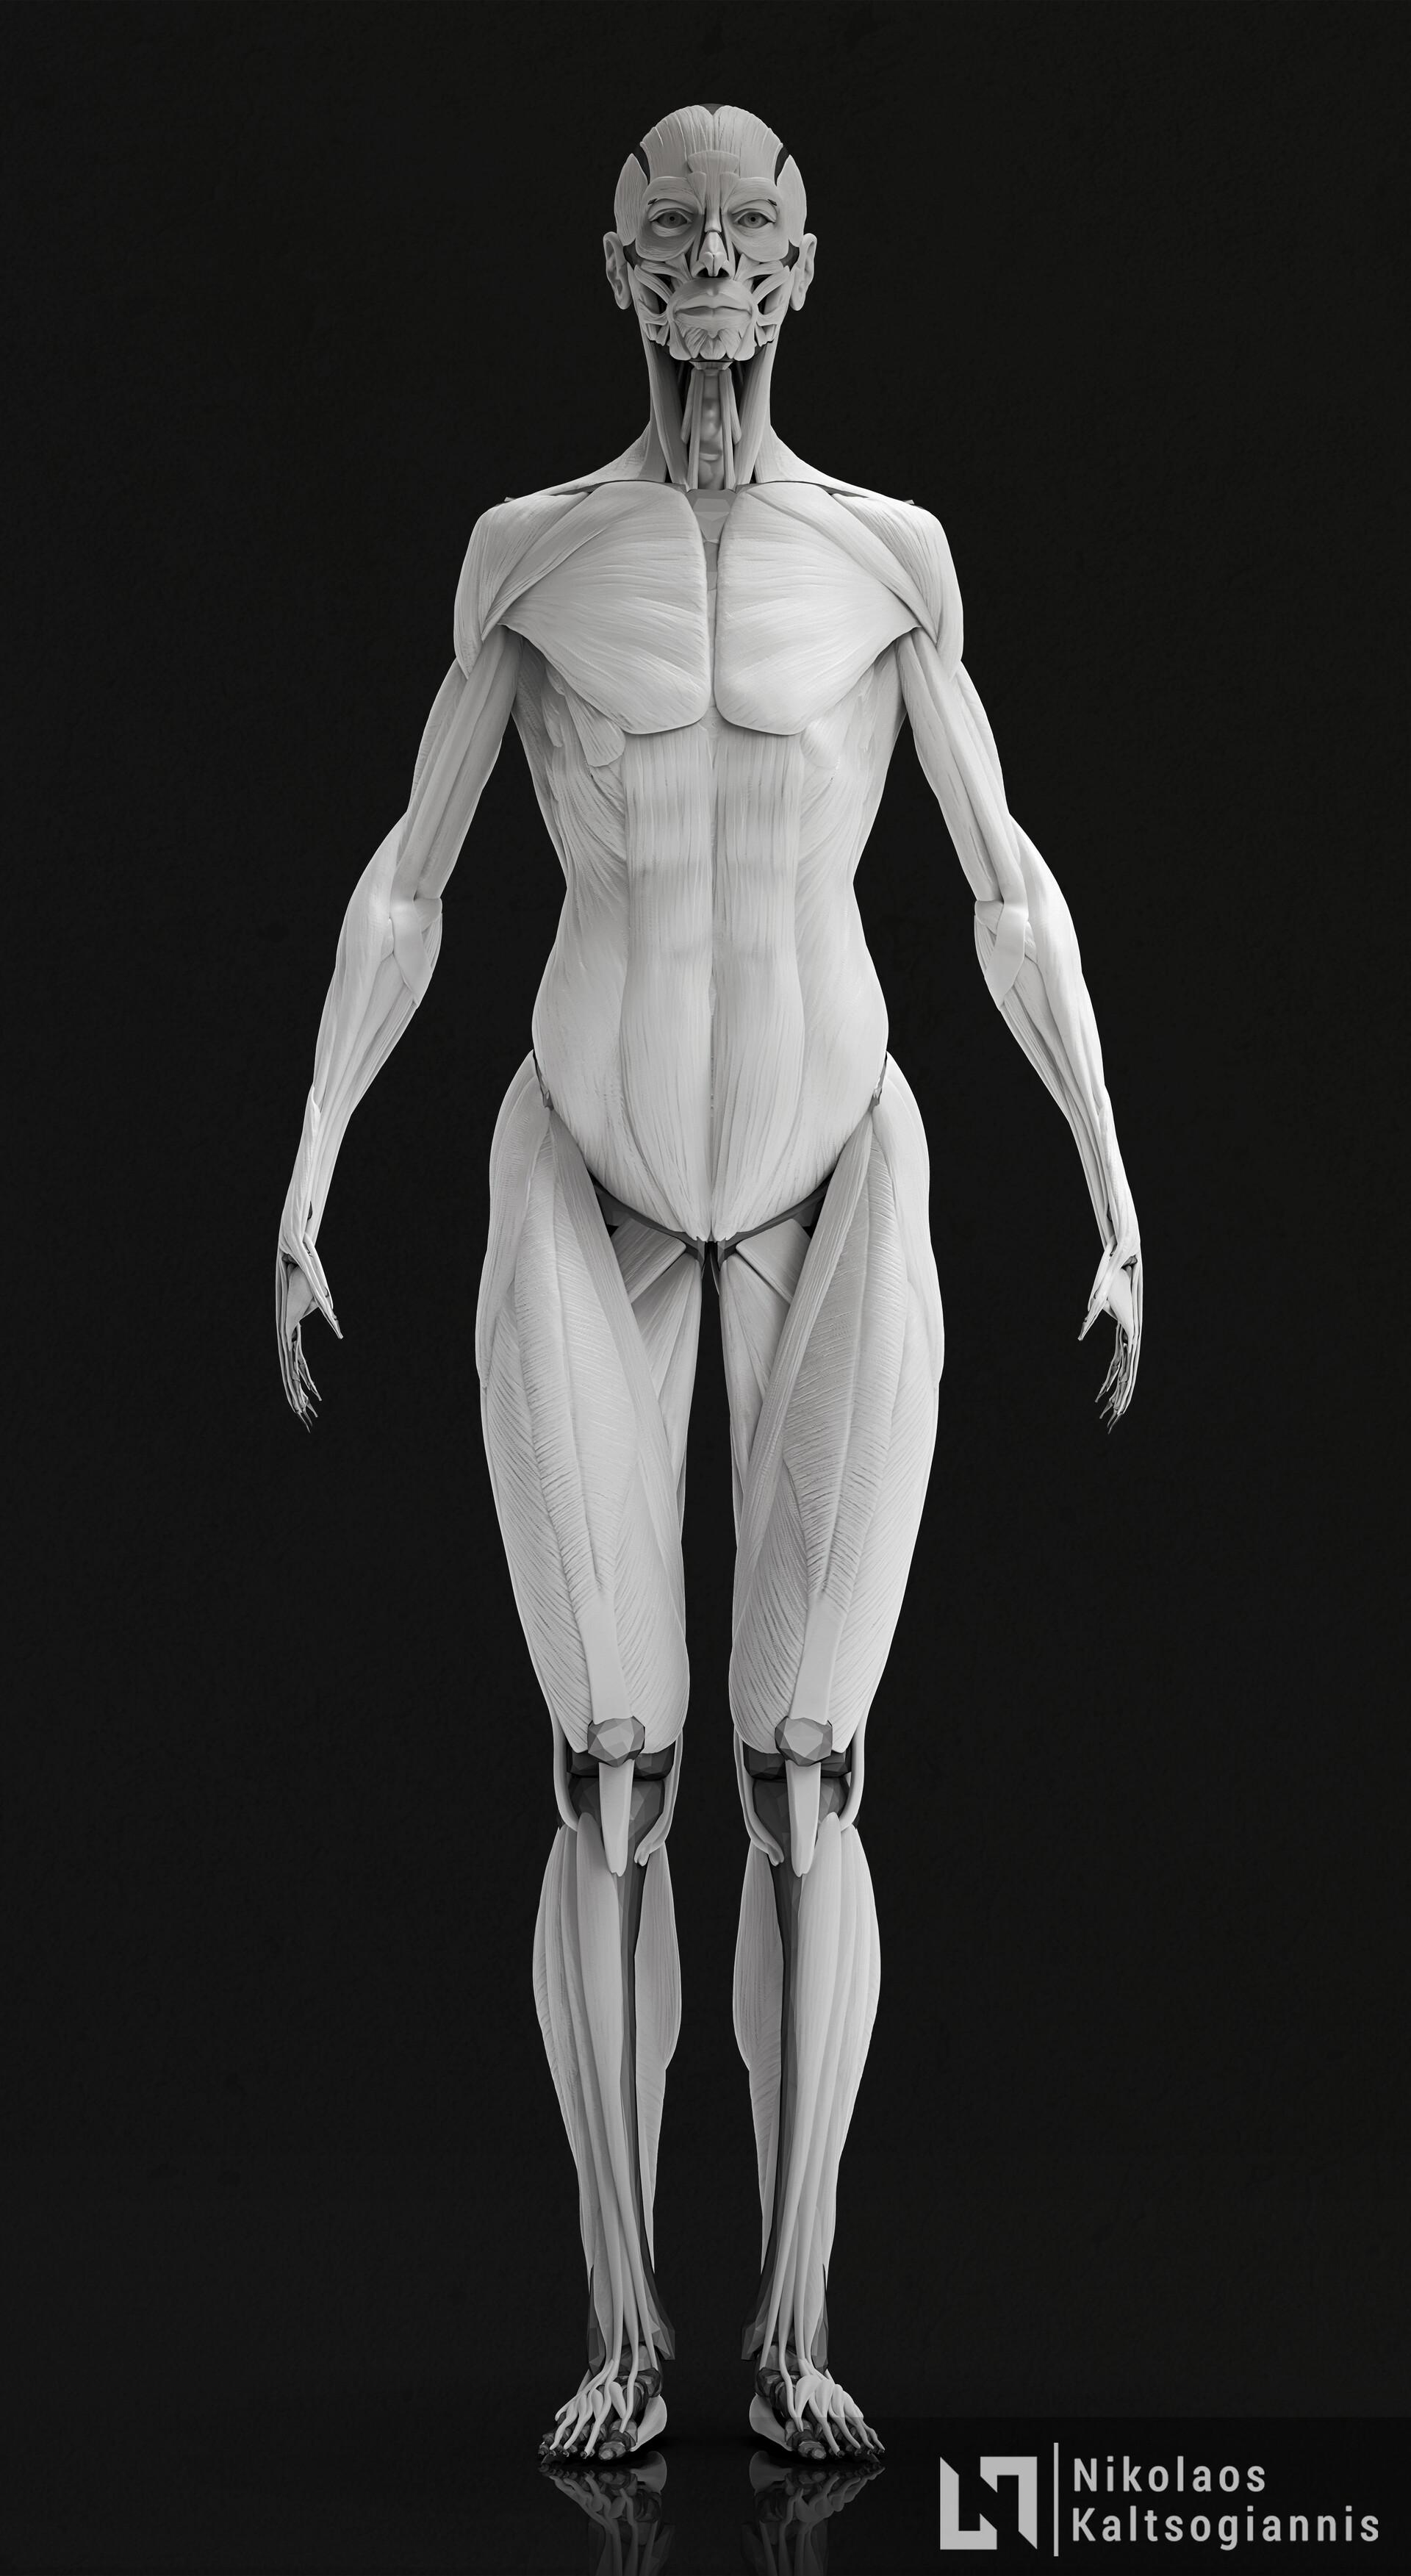 Nikolaos kaltsogiannis female anatomy echorche 02